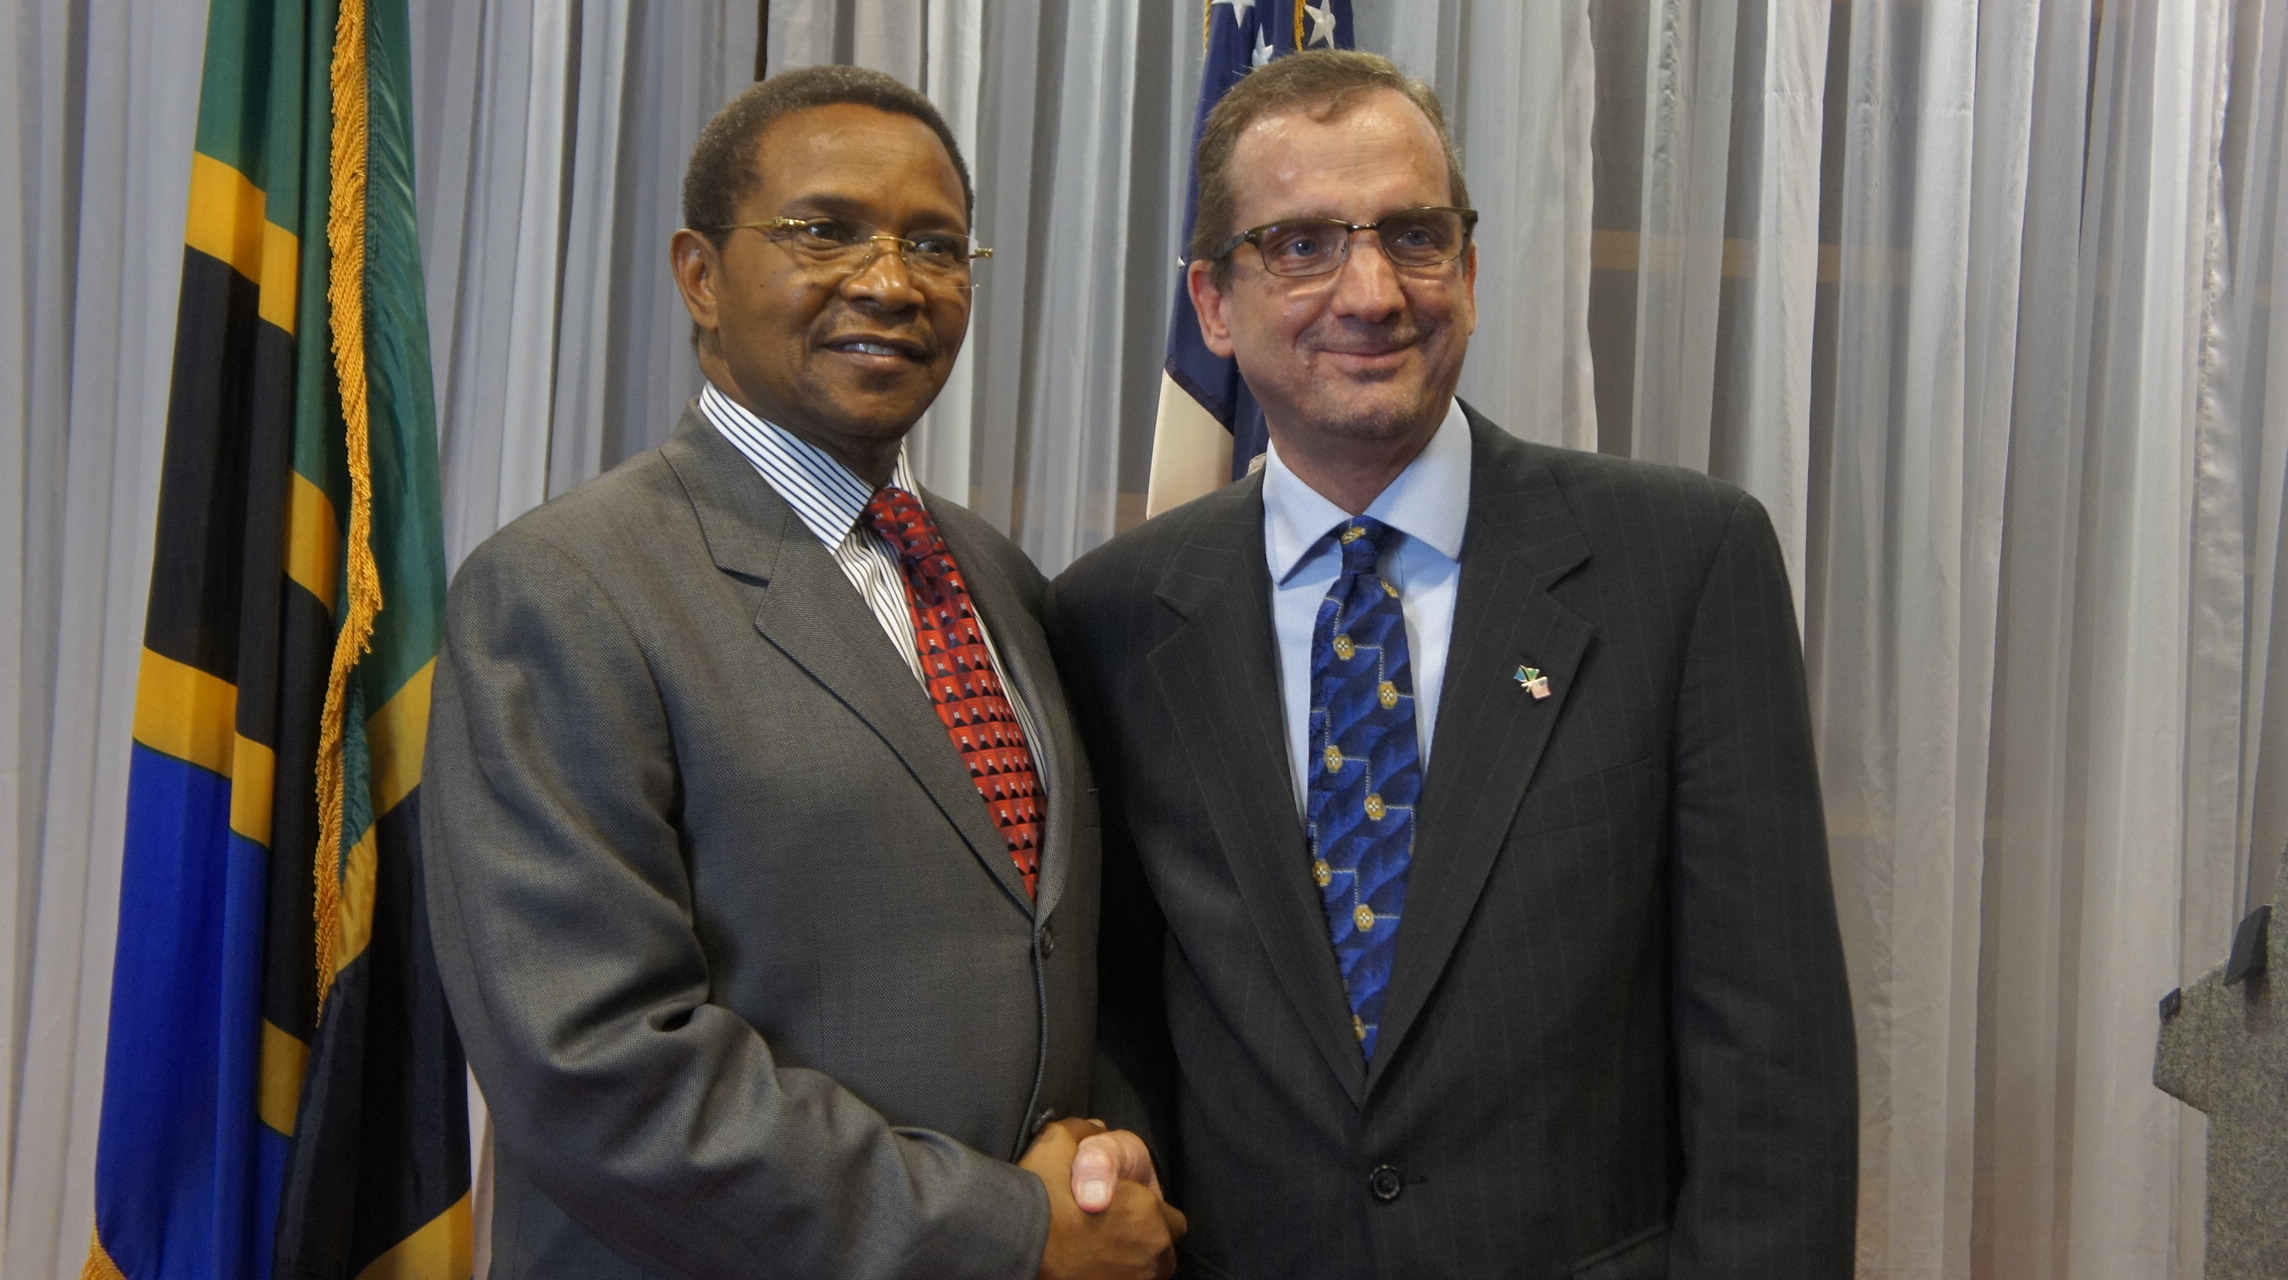 Griswold with Tanzania President Jakaya Kikwete